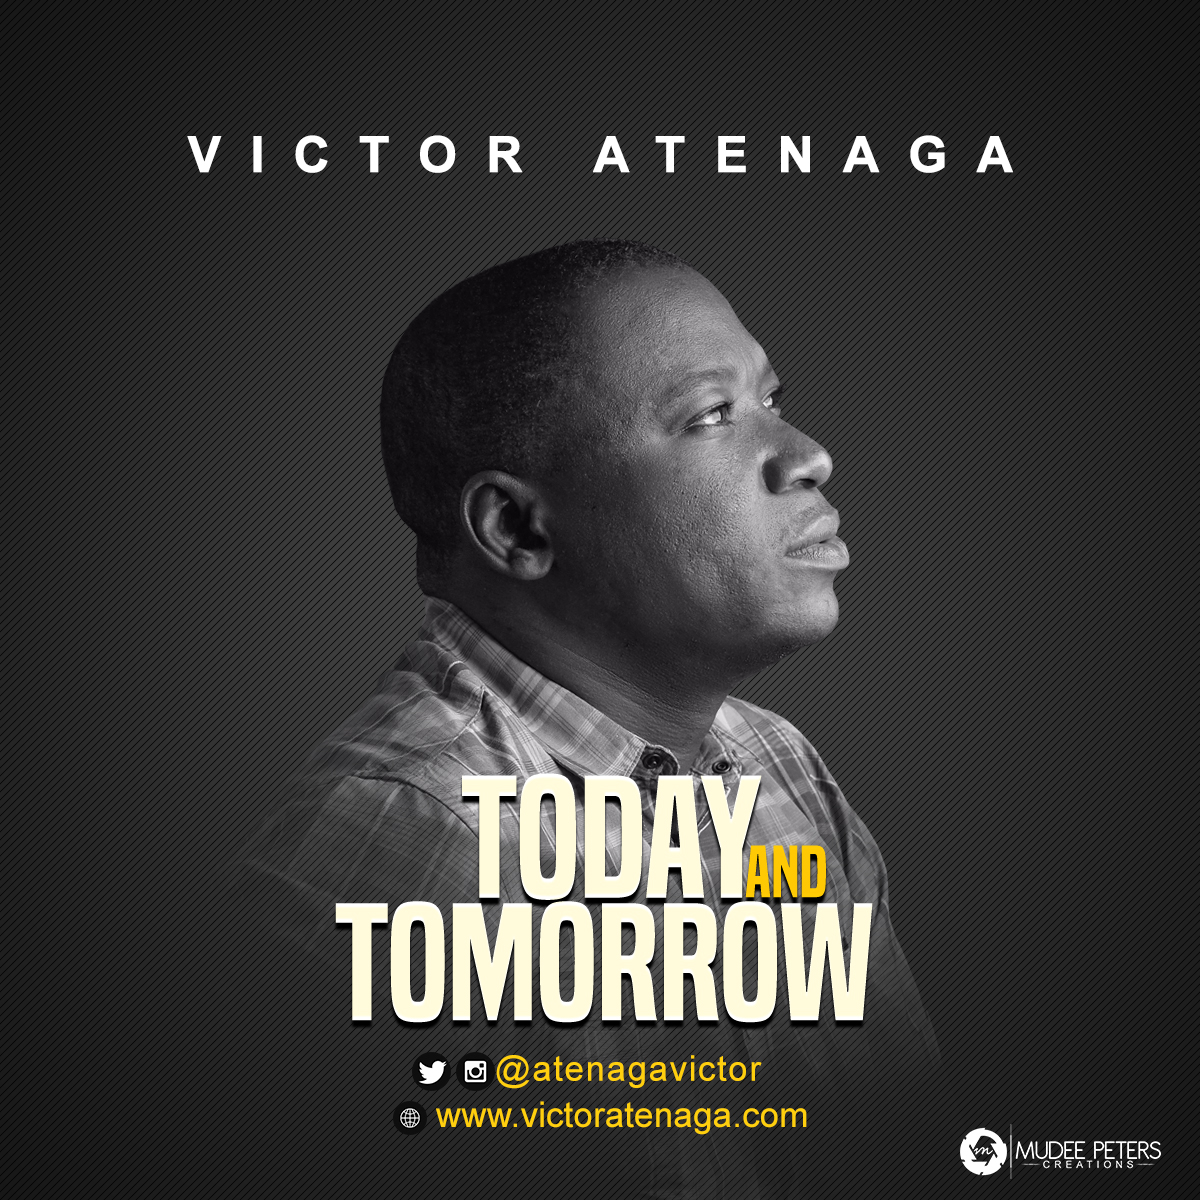 Victor Atenaga - Today and Tomorrow